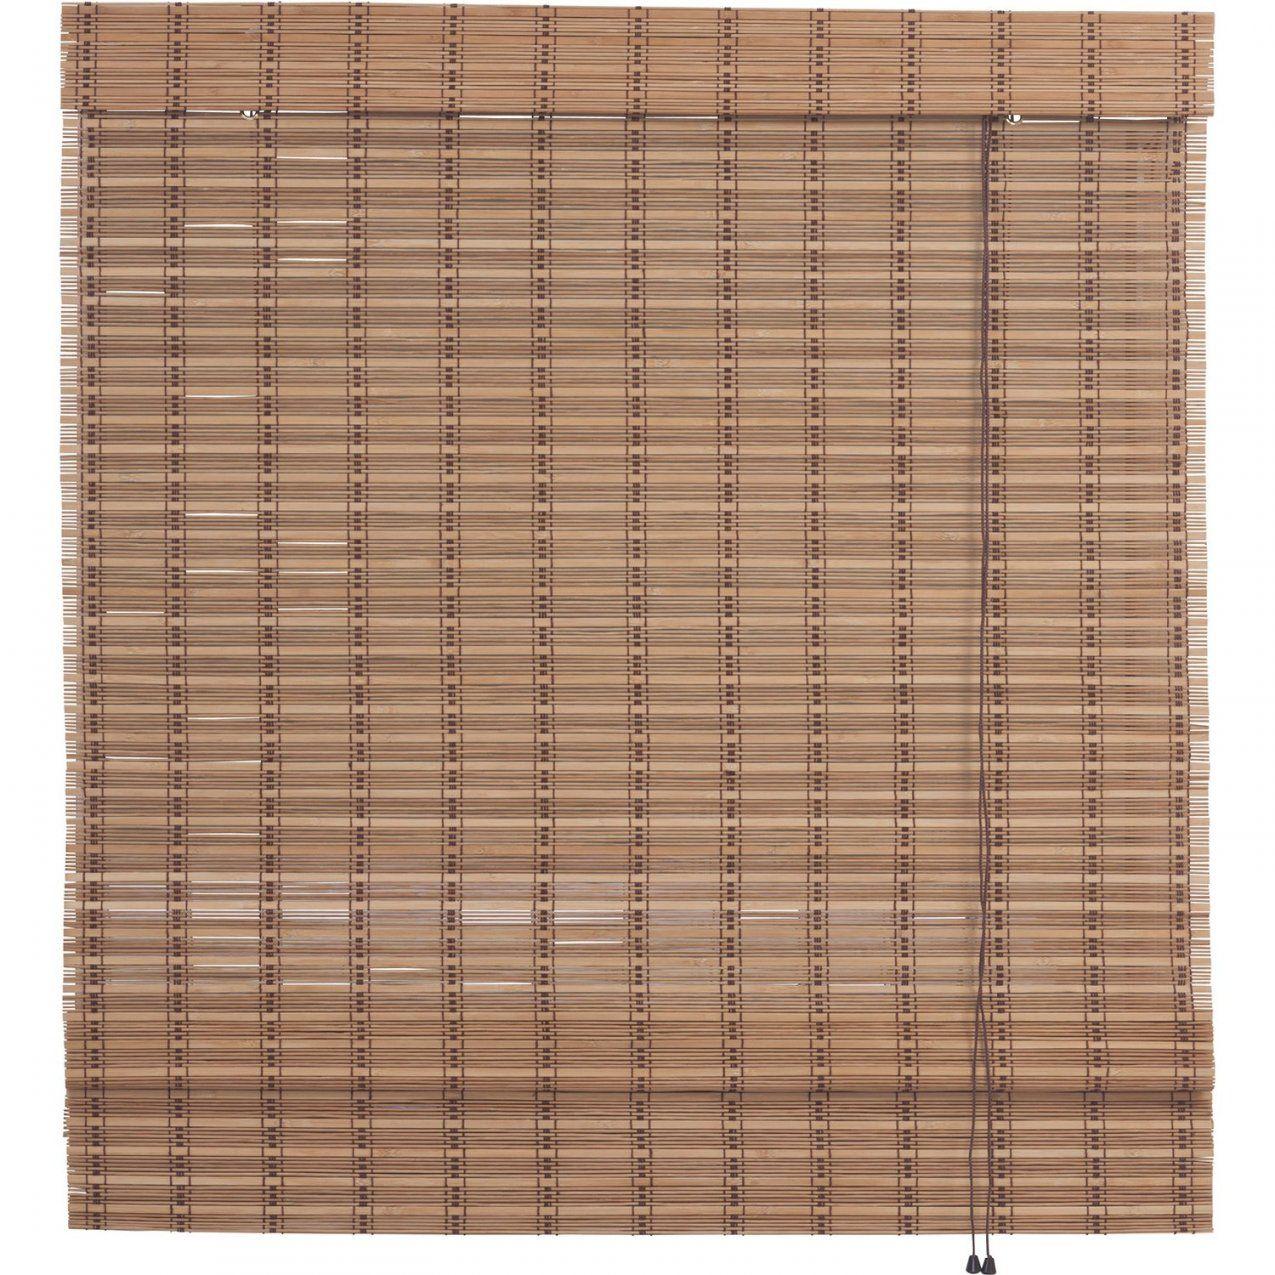 Obi Bambusraffrollo Mataro 60 Cm X 160 Cm Eiche Kaufen Bei Obi von Raffrollo 160 Cm Breit Bild